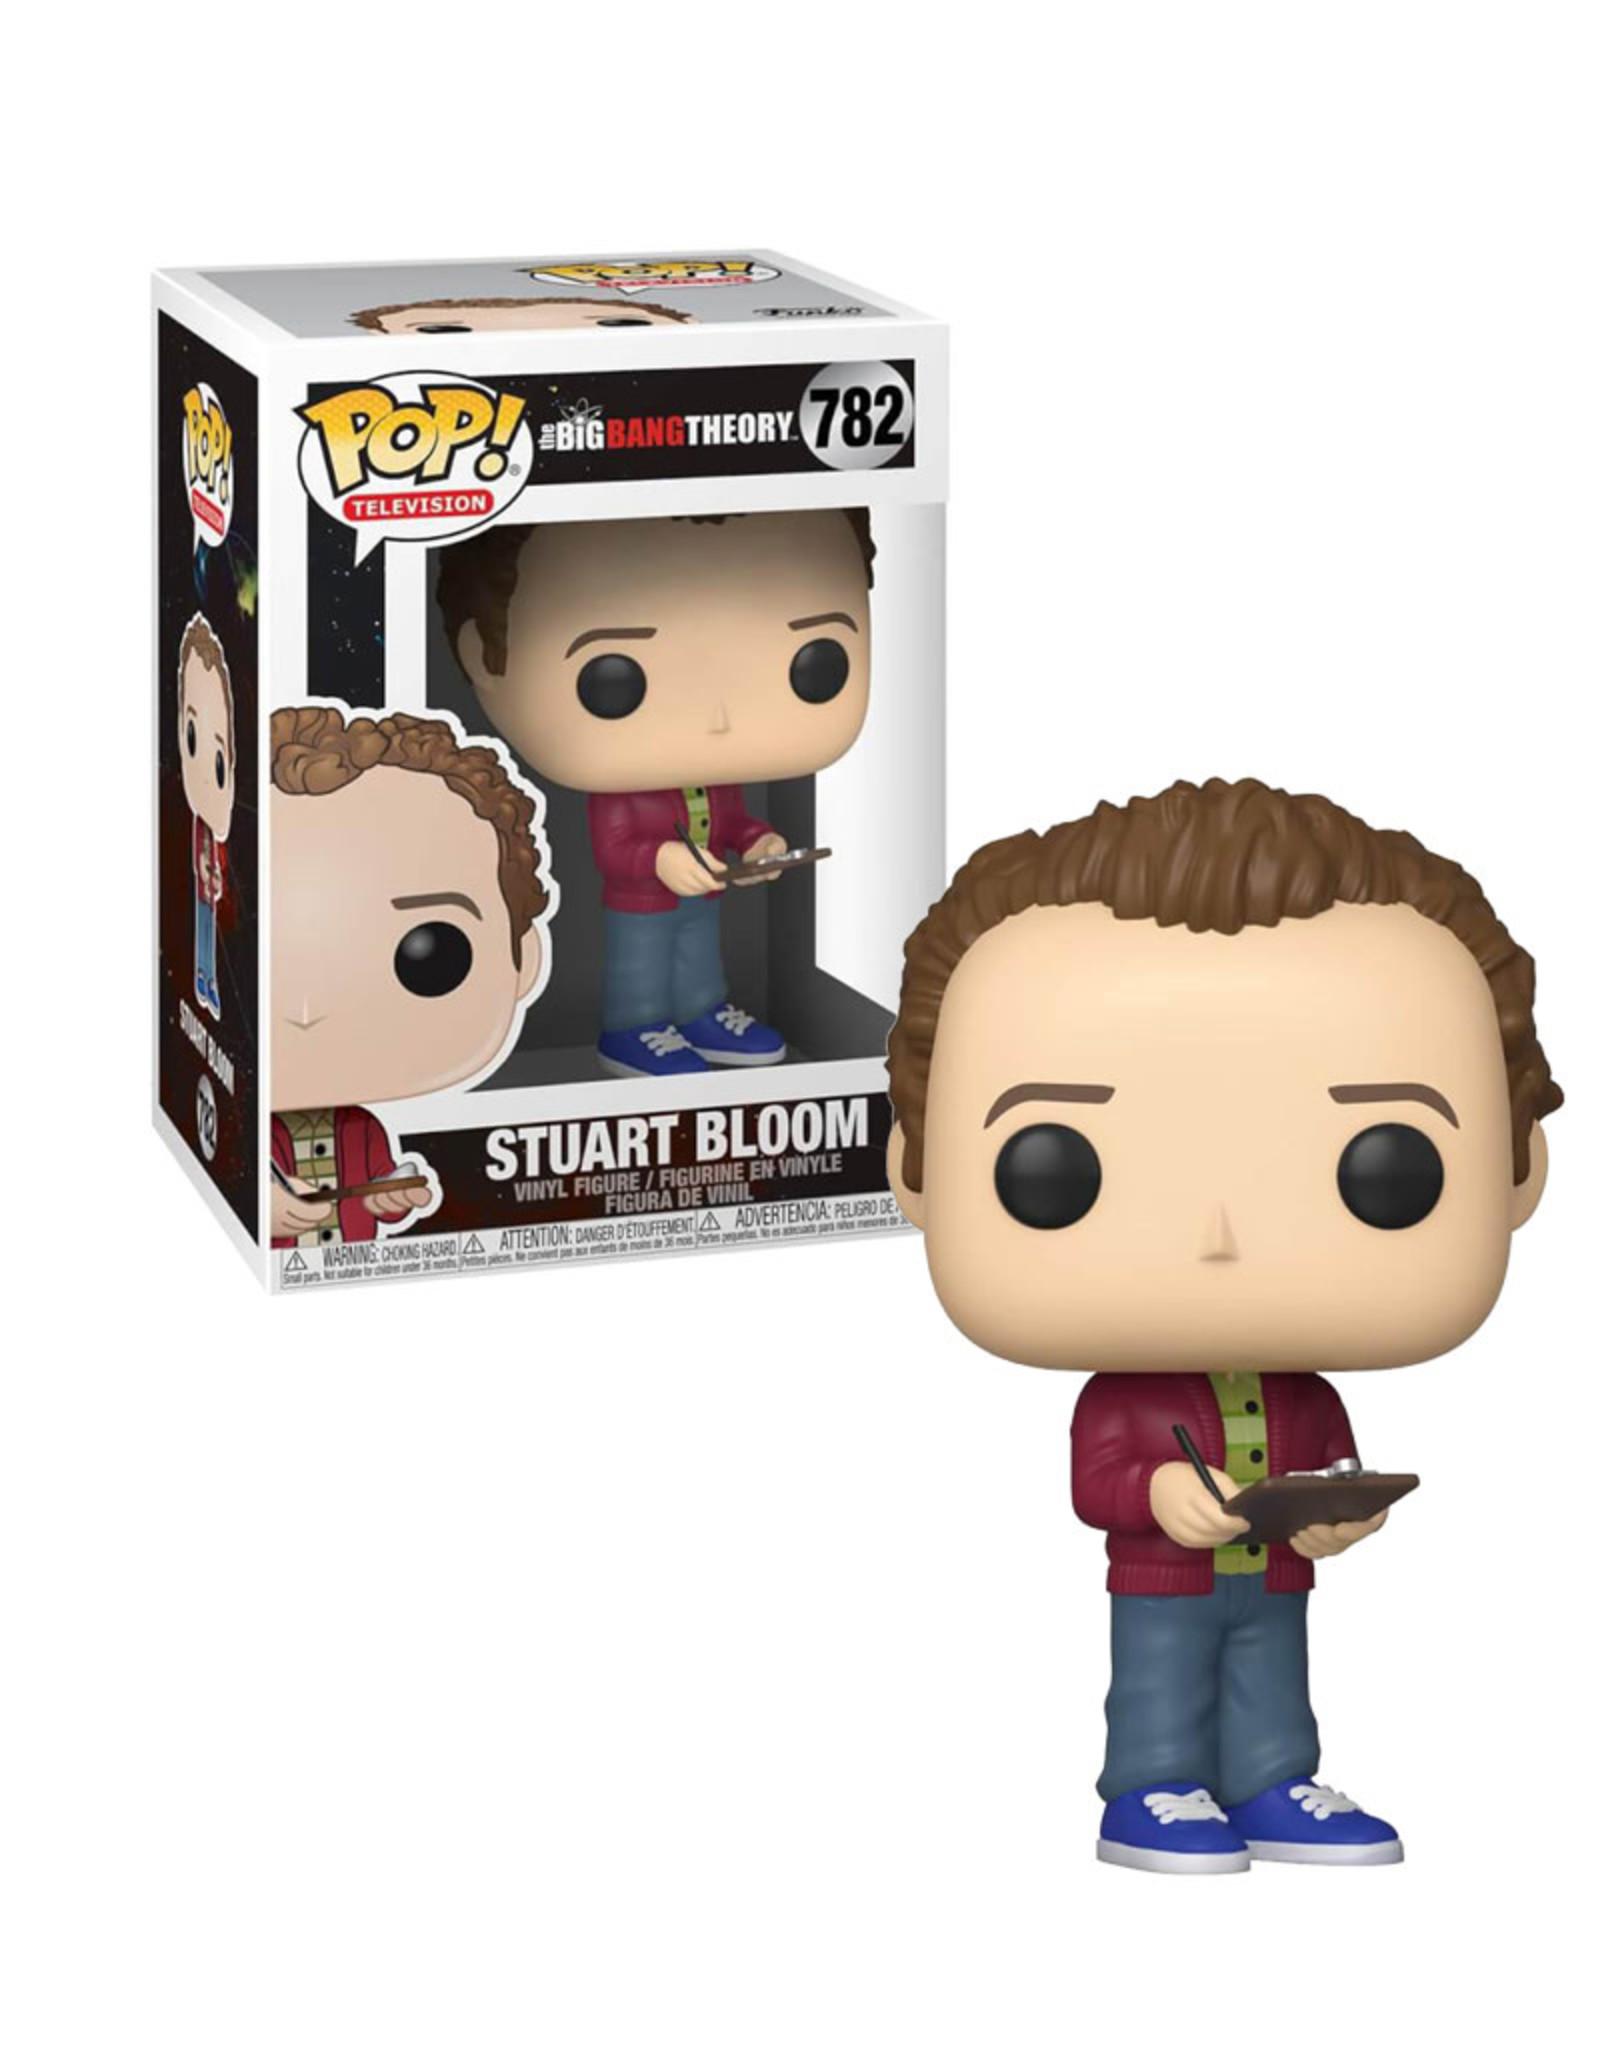 Stuart Bloom 782 ( Funko Pop ) The Big Bang Theory